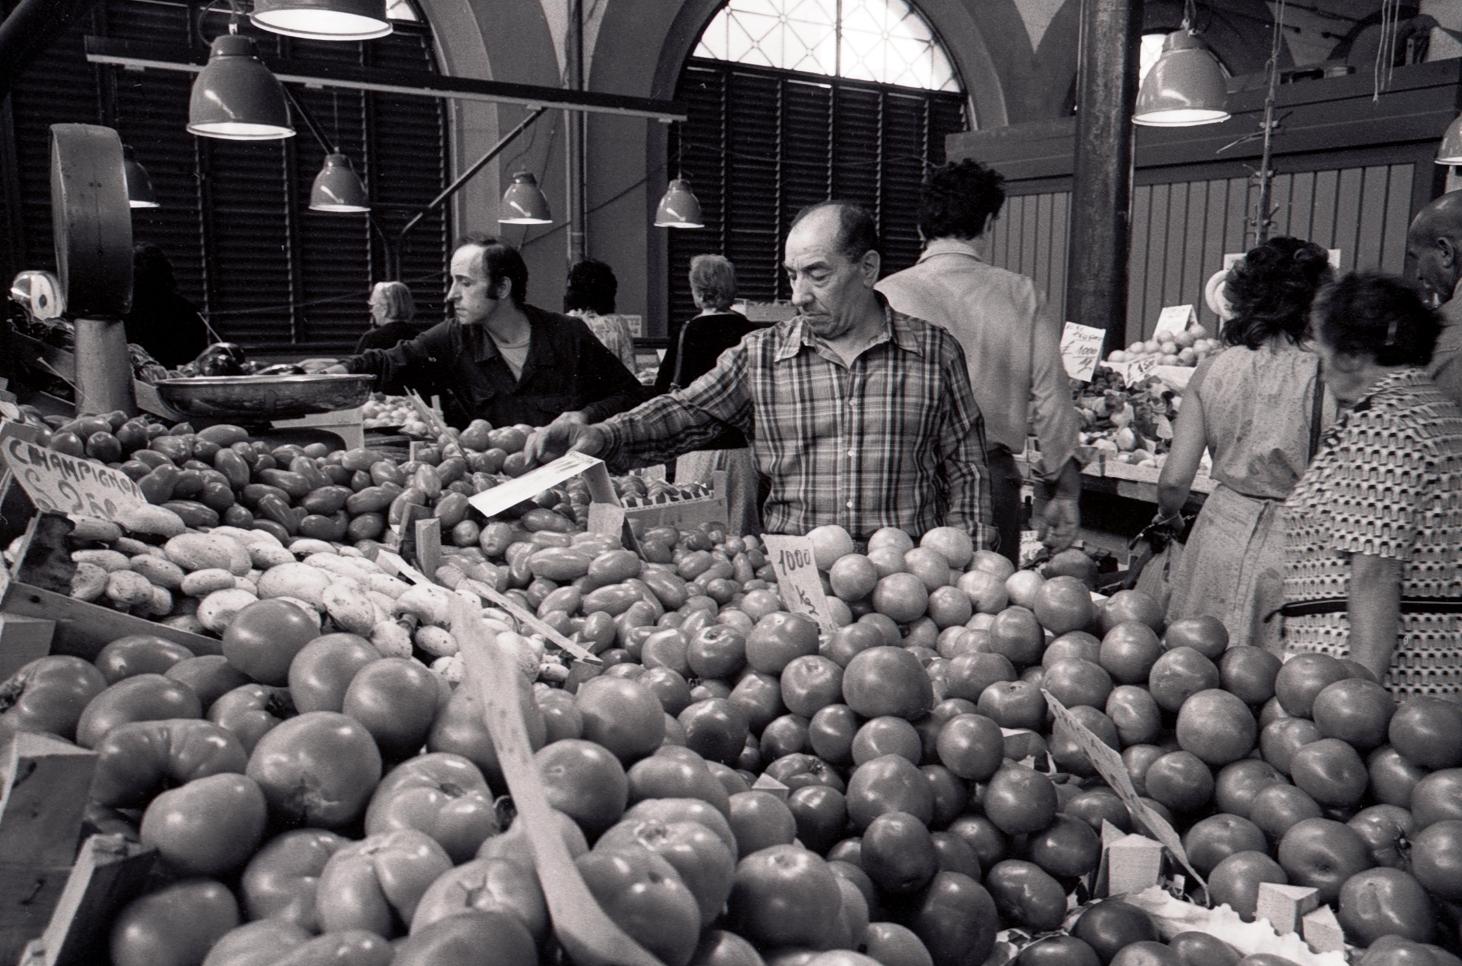 Tomato Seller Mercato Centrale Florence 1983